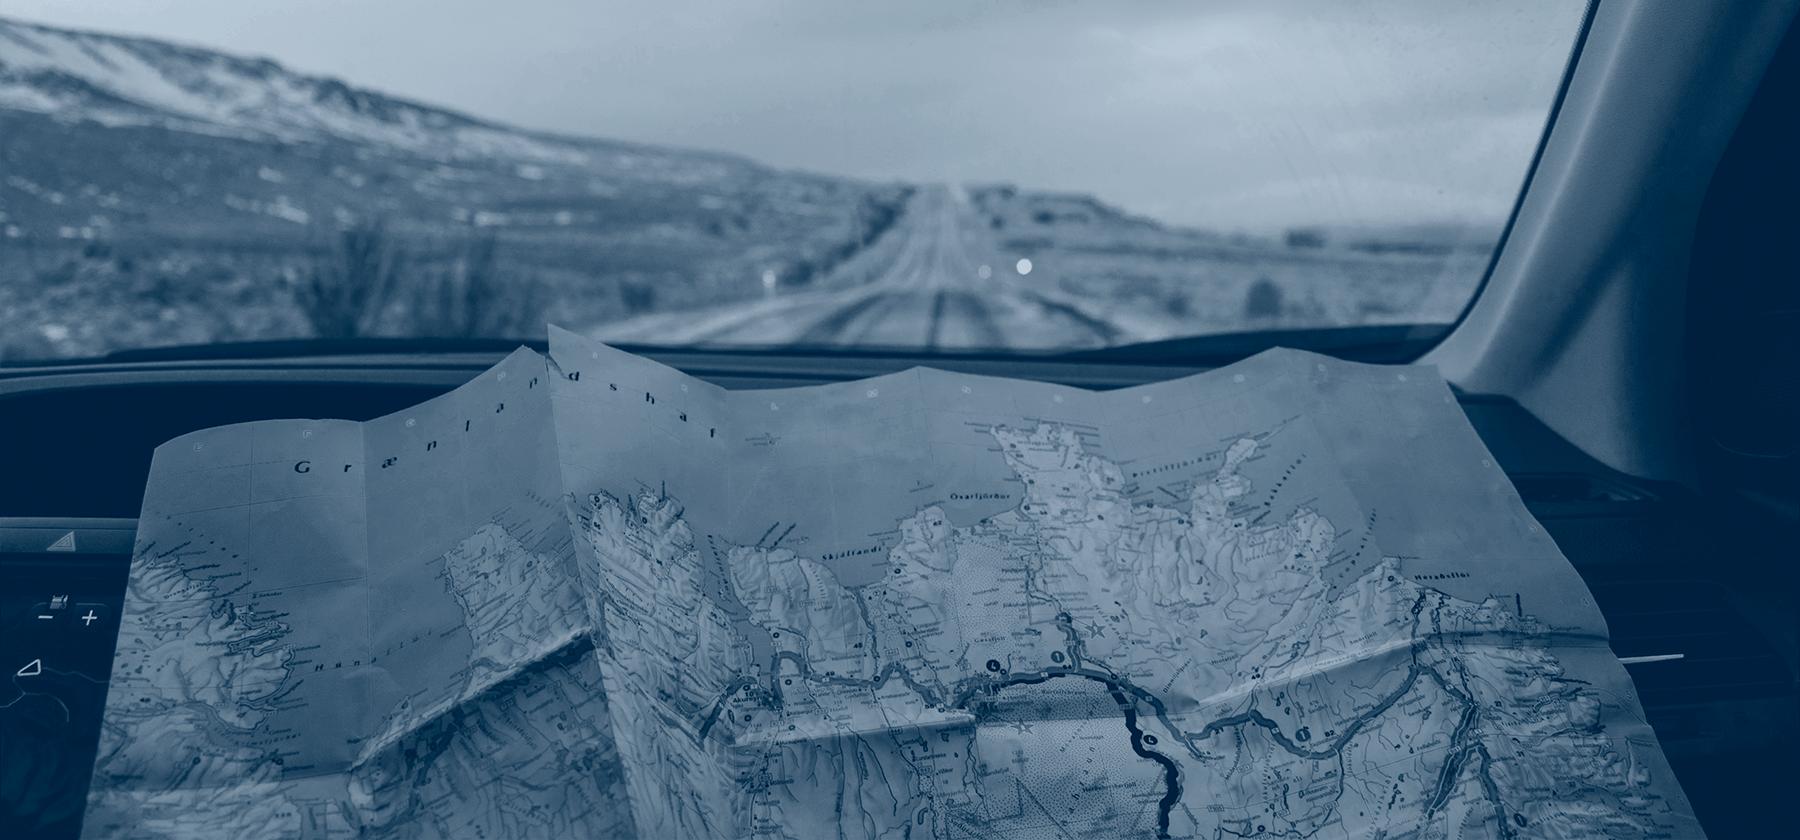 Como hacer un value stream mapping